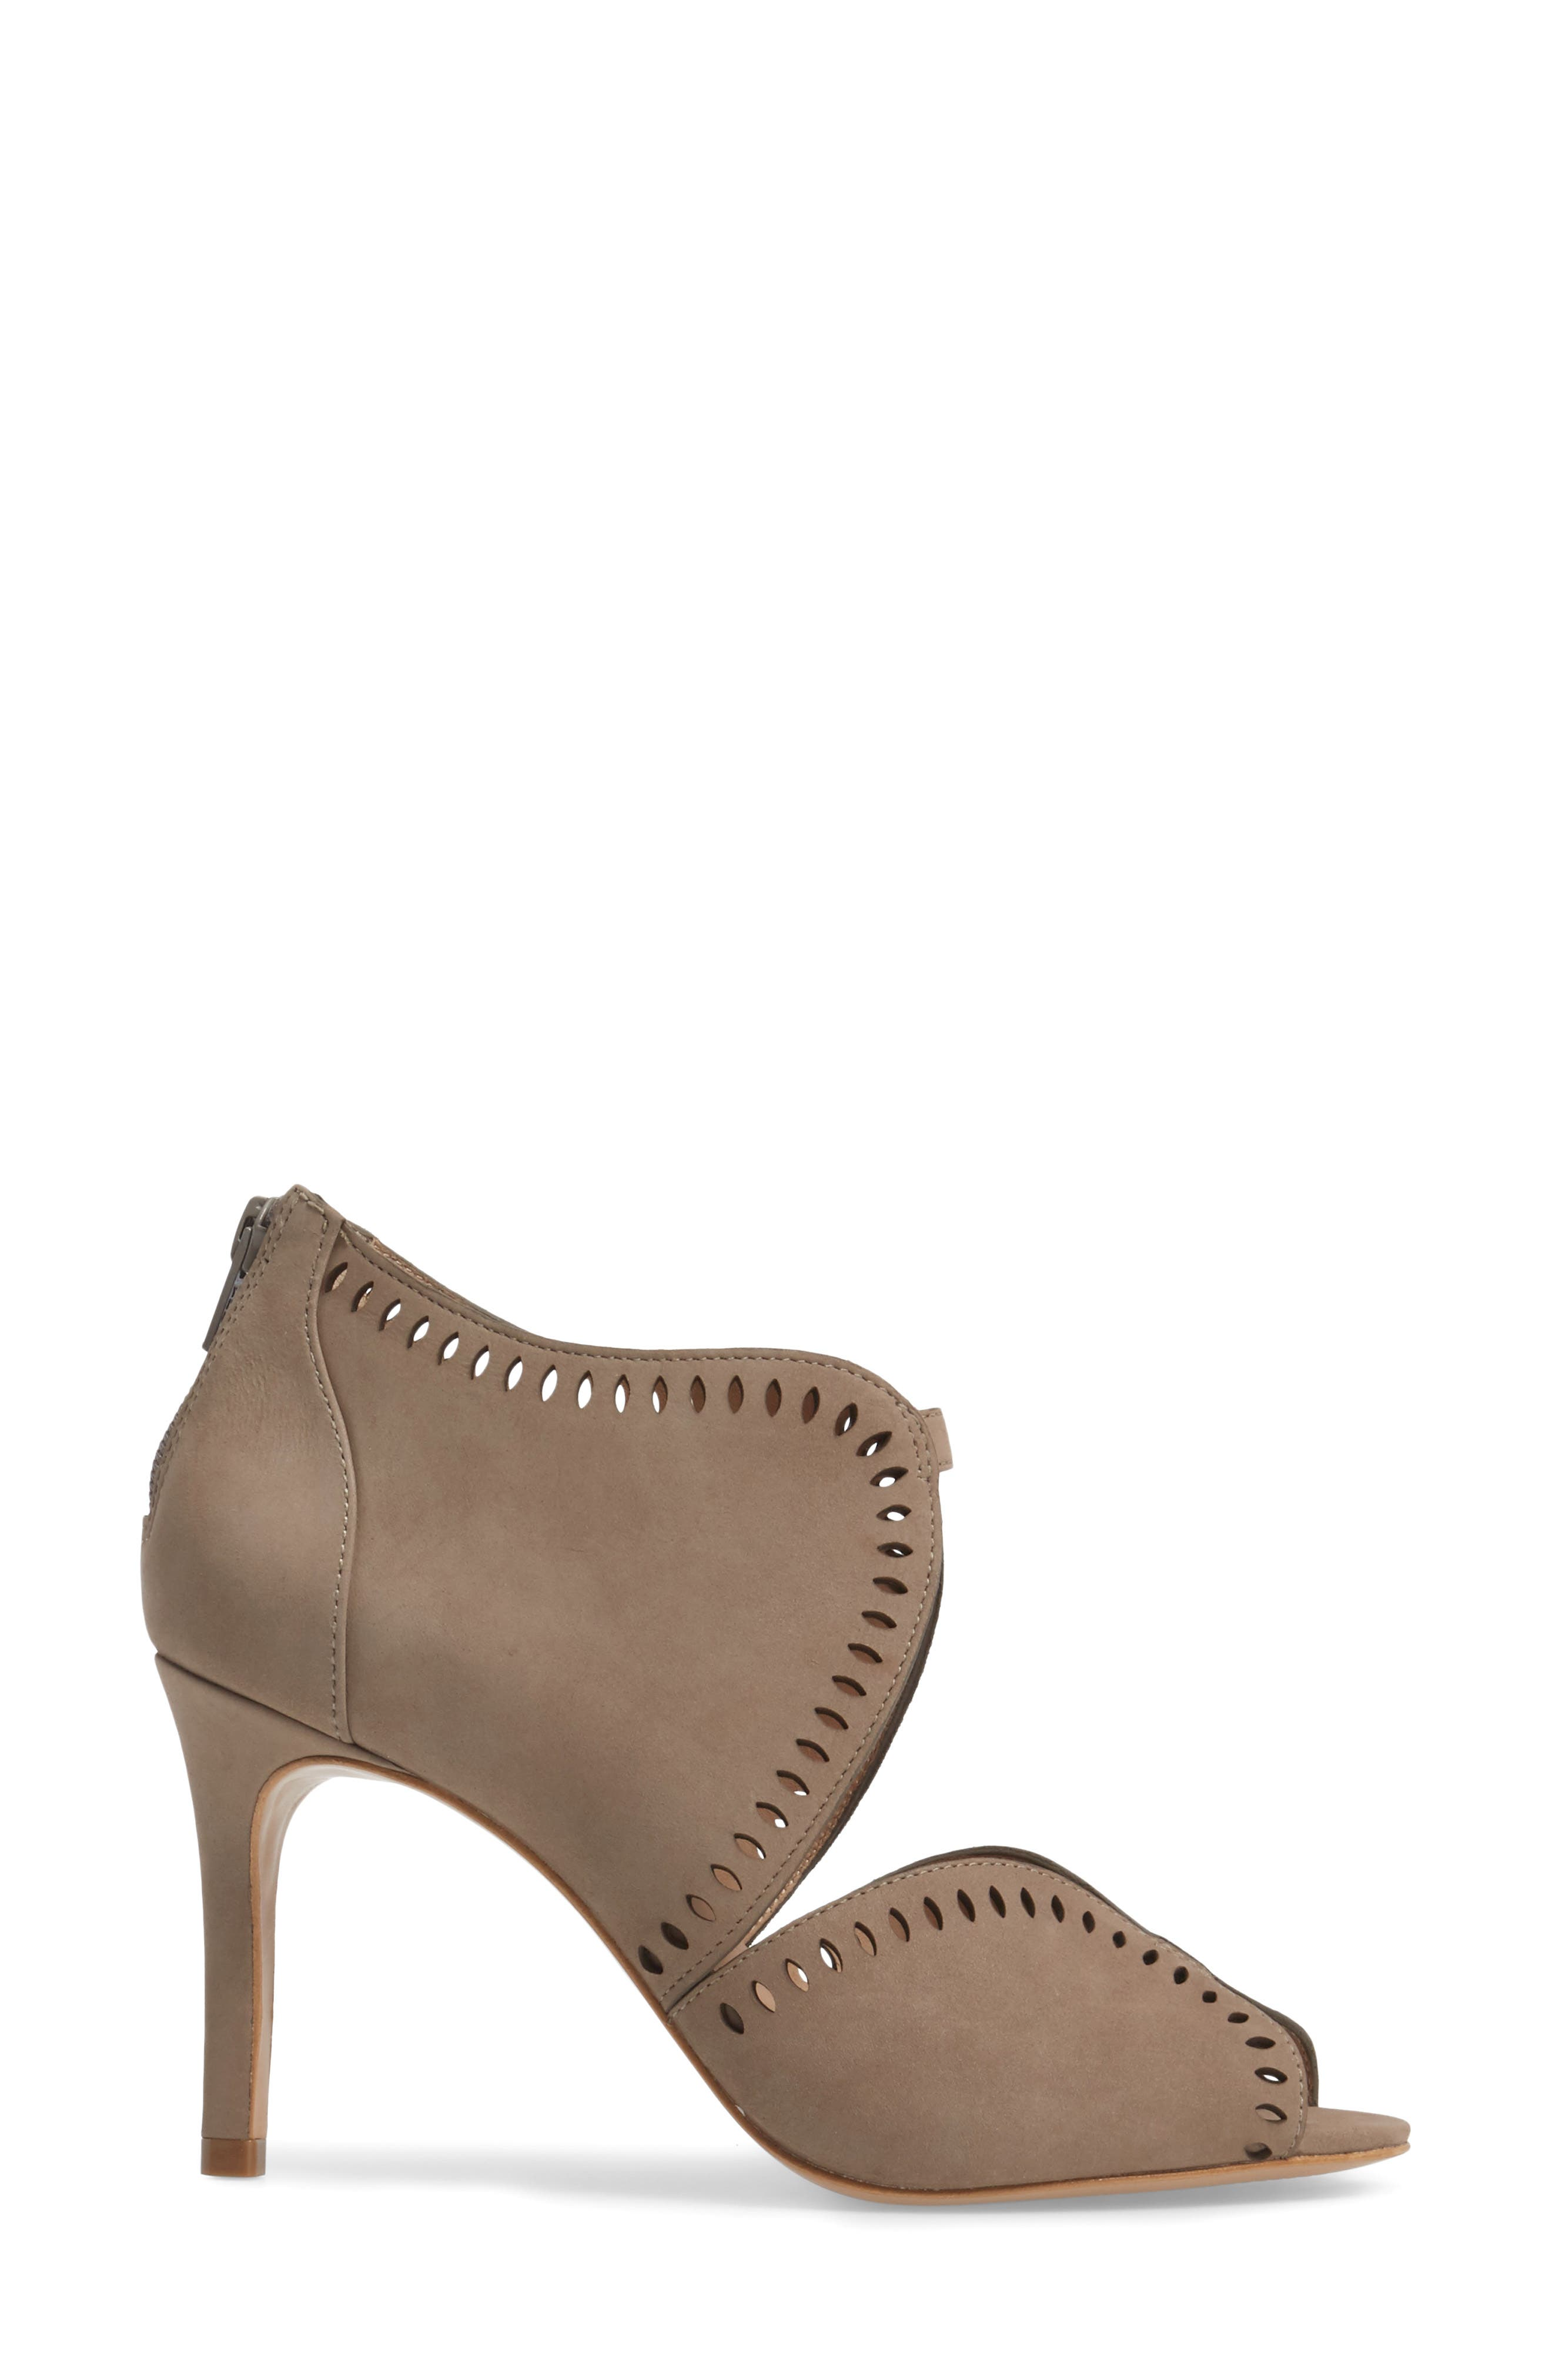 Mallia Perforated Sandal,                             Alternate thumbnail 6, color,